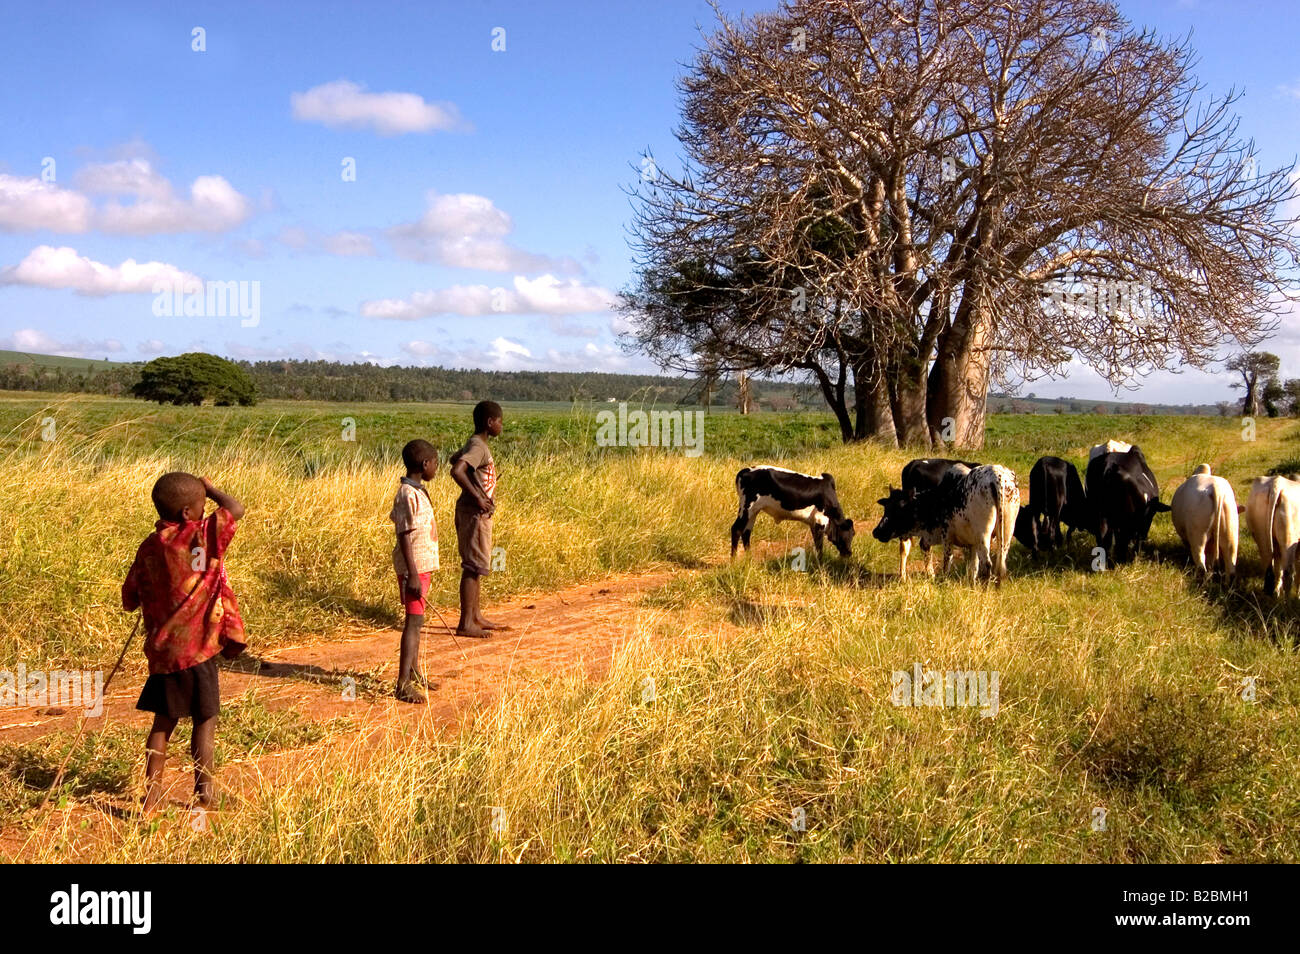 Children tending cattle in the hinterland between Mombassa and Malindi Kenya East Africa - Stock Image